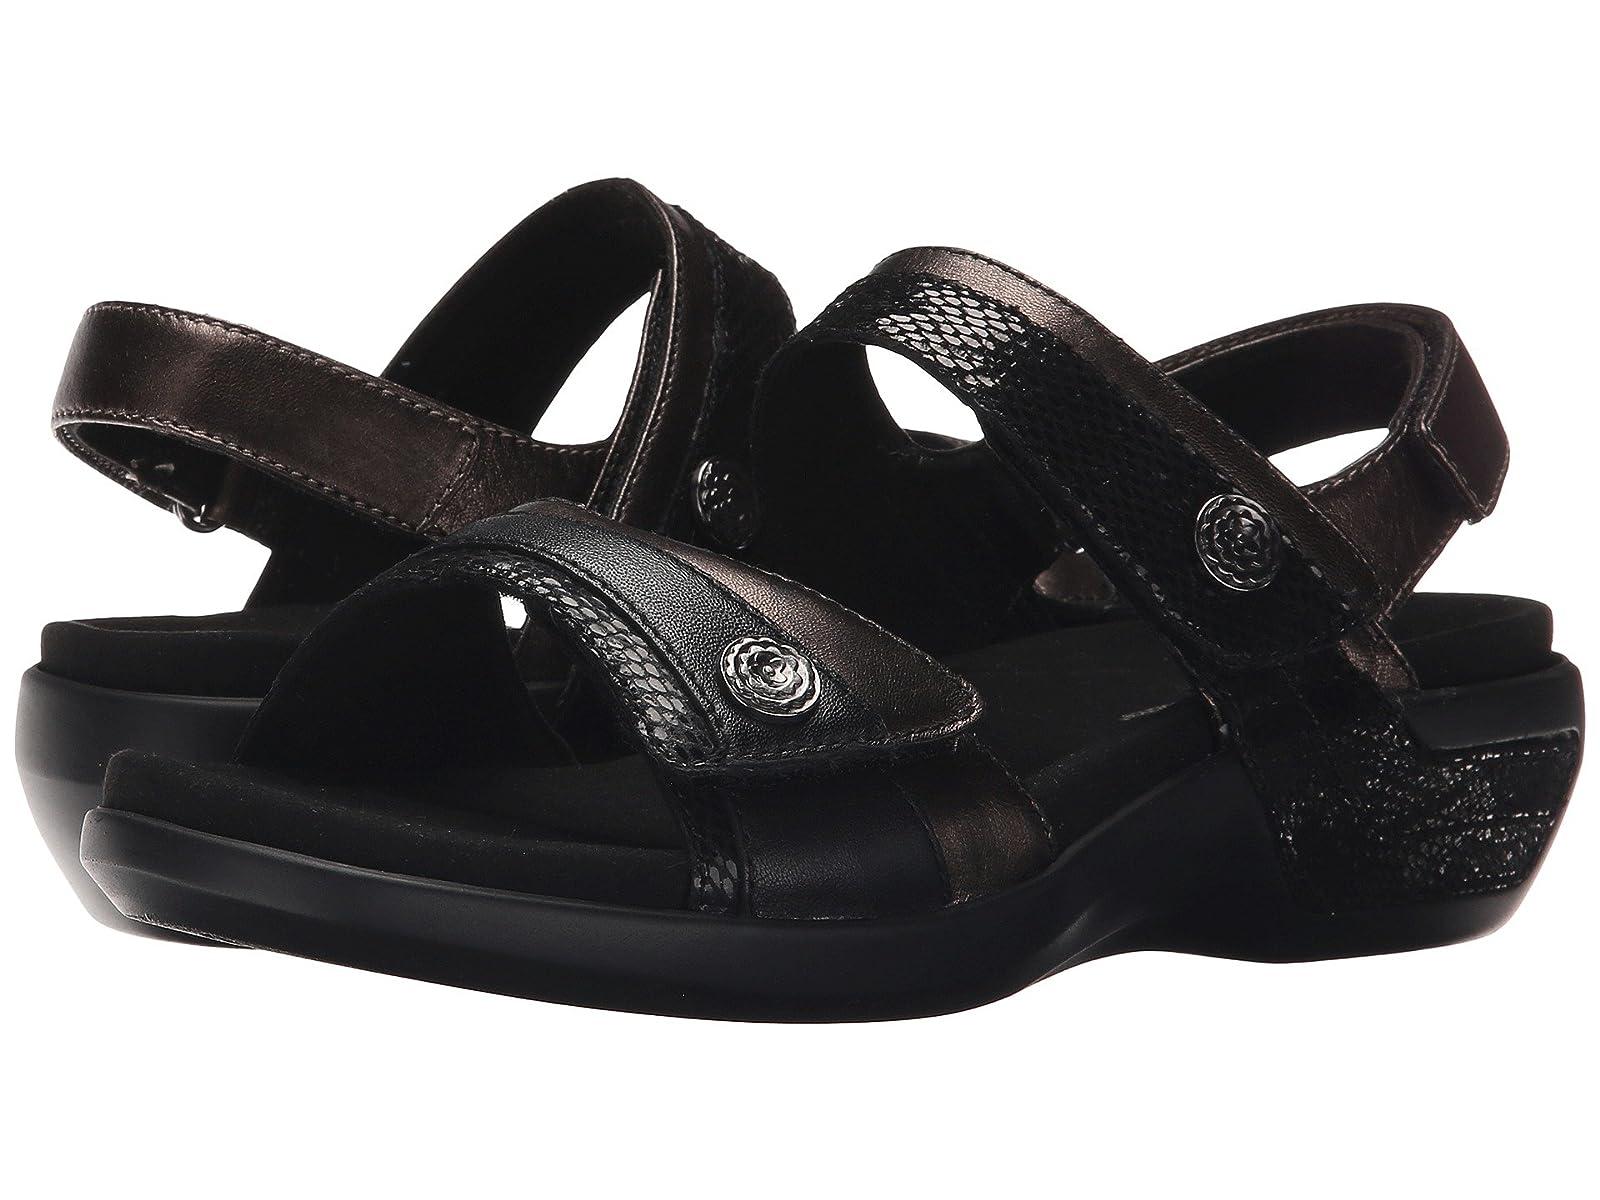 Aravon Katherine-ARComfortable and distinctive shoes